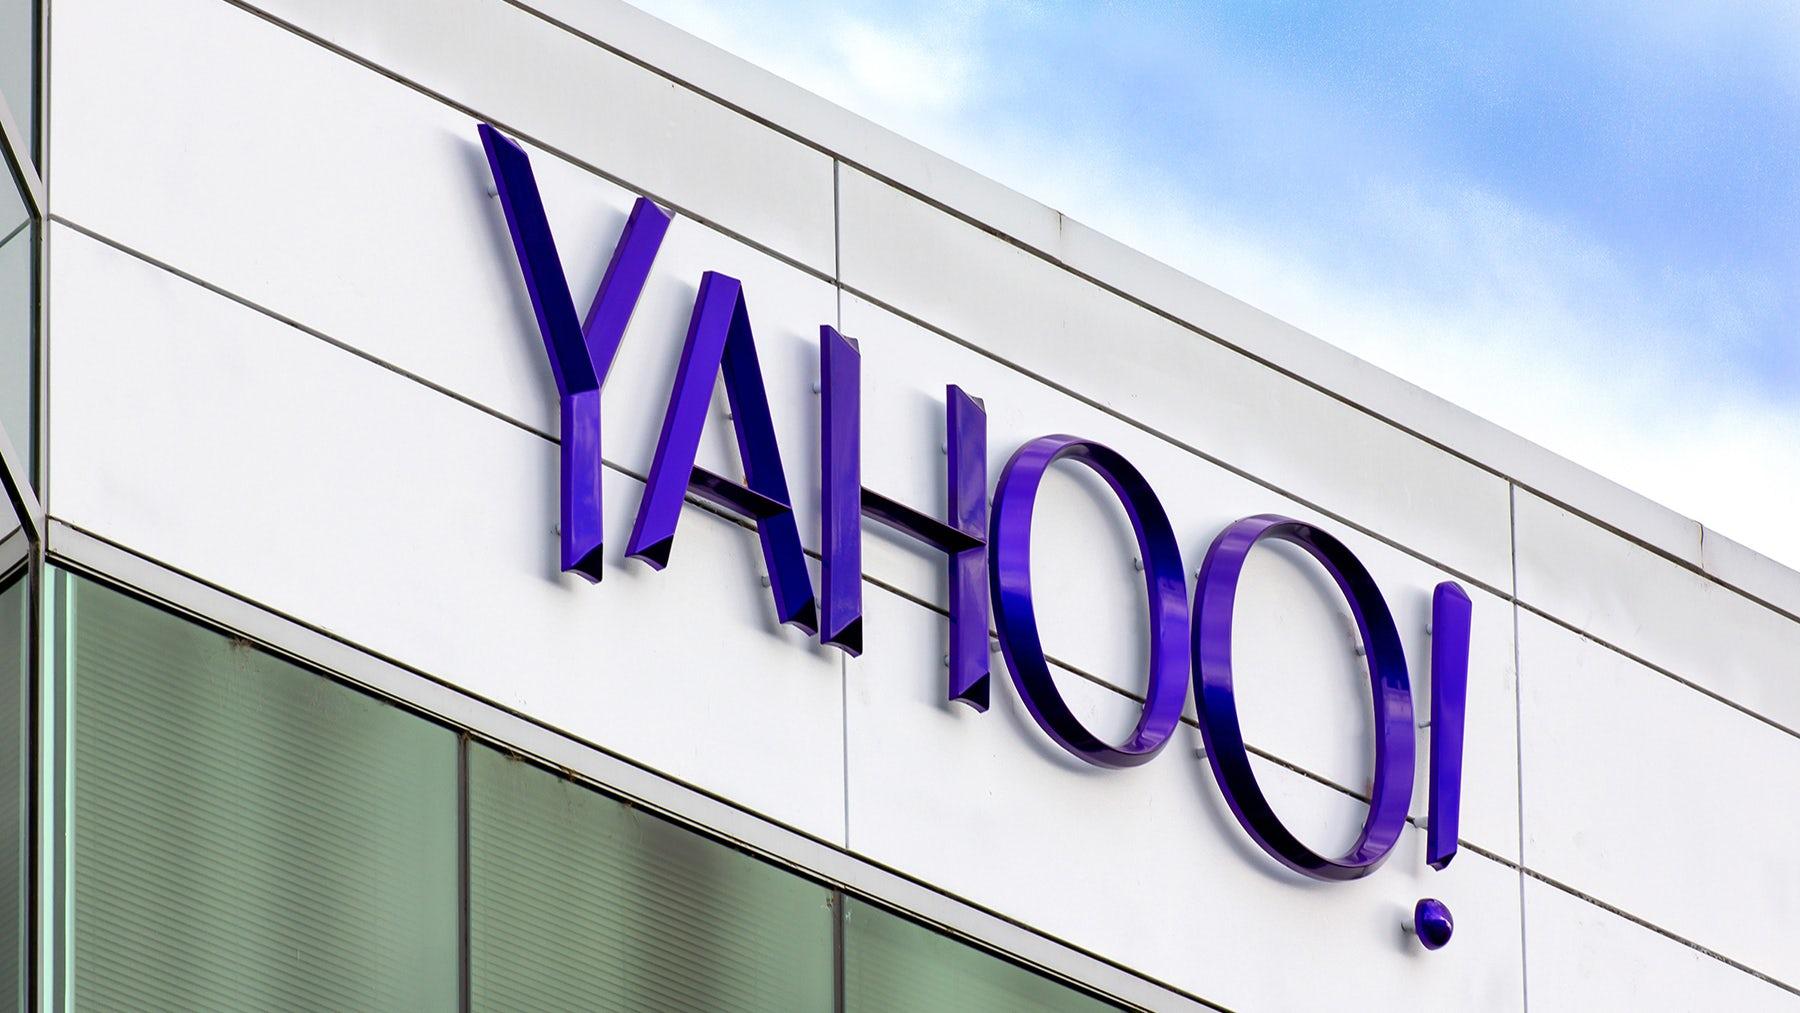 Yahoo headquarters | Source: Shutterstock